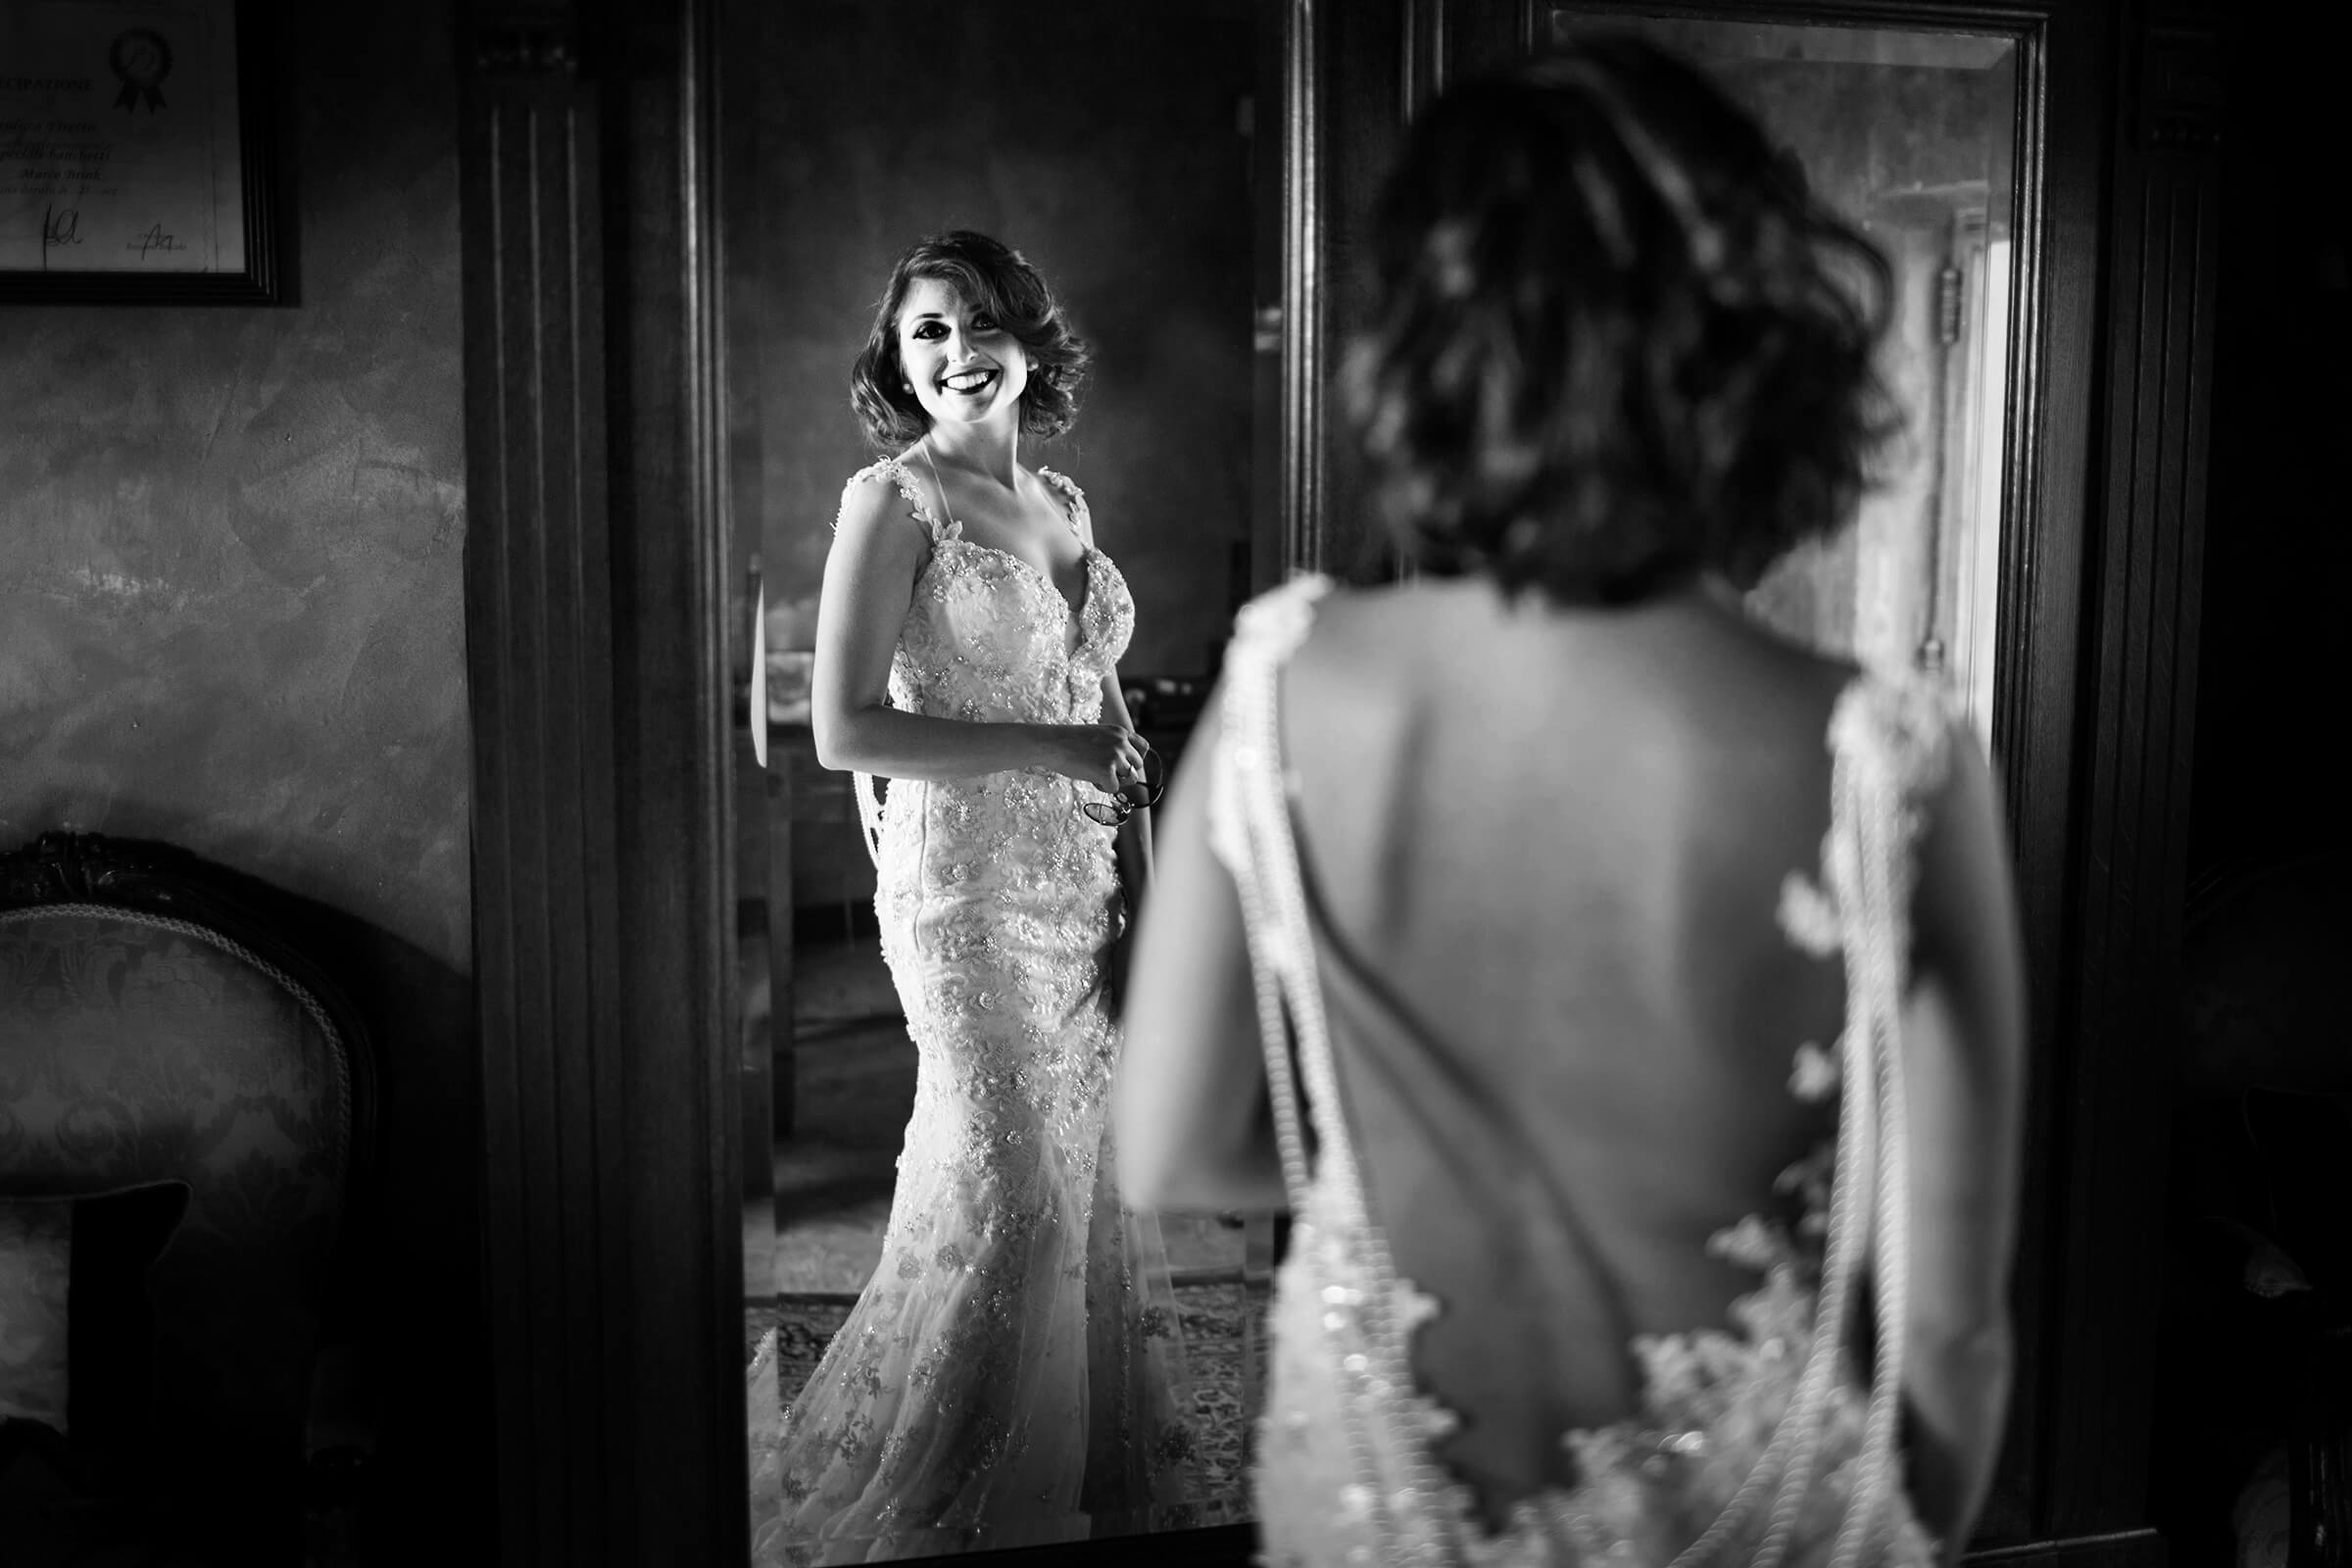 glamorous-bride-in-mirror-by-nino-lombardo-photographer